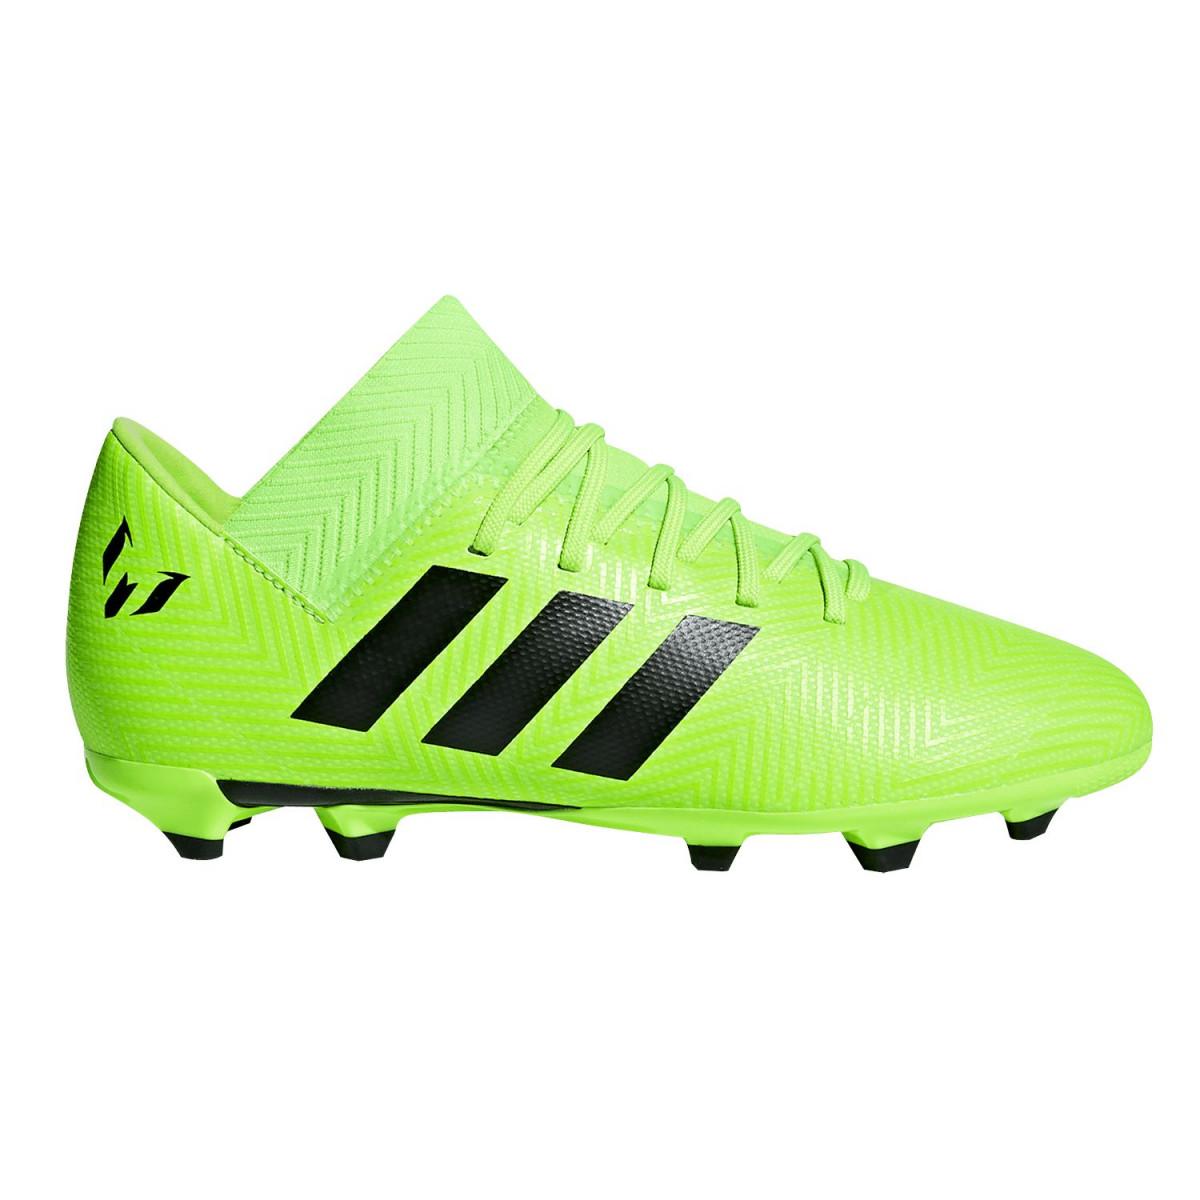 f34936e63 Botines Adidas Nemeziz Messi 18.3 Fg